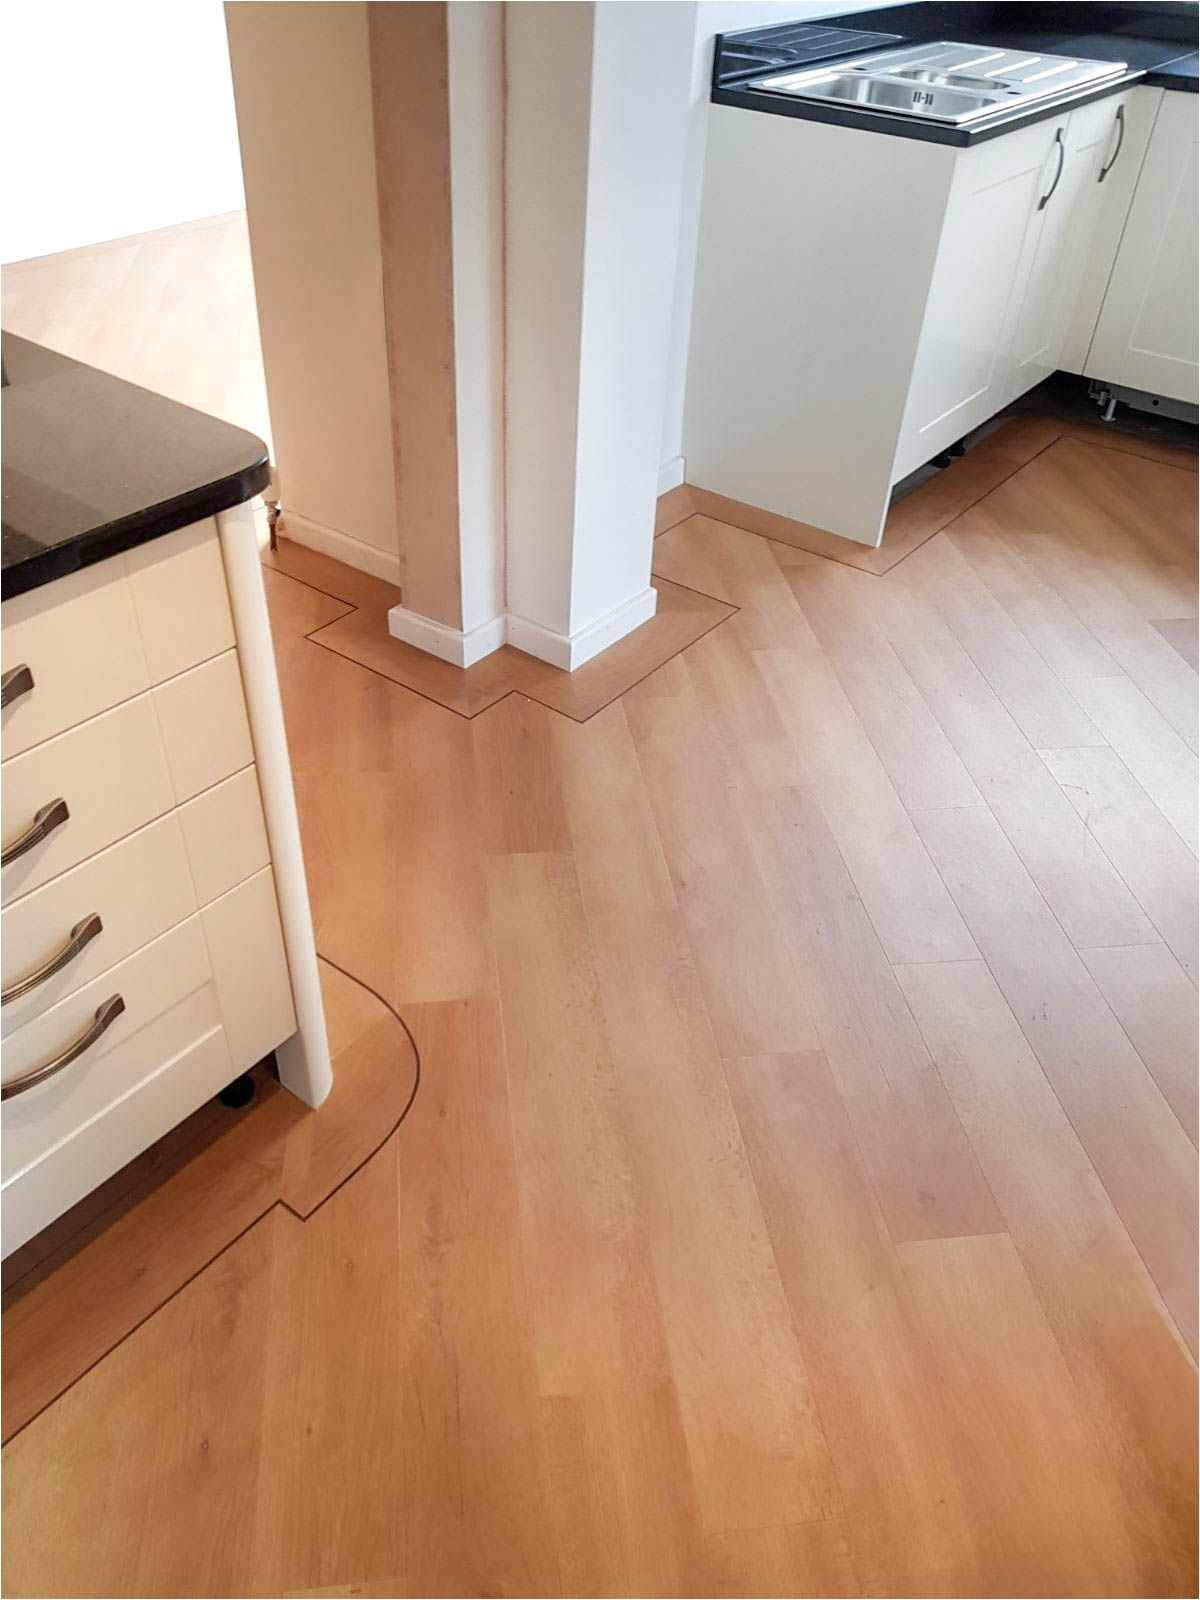 Laying Grip Strip Flooring Kitchen Vinyl Flooring Karndean Design Flooring Opus Wp314 Cera